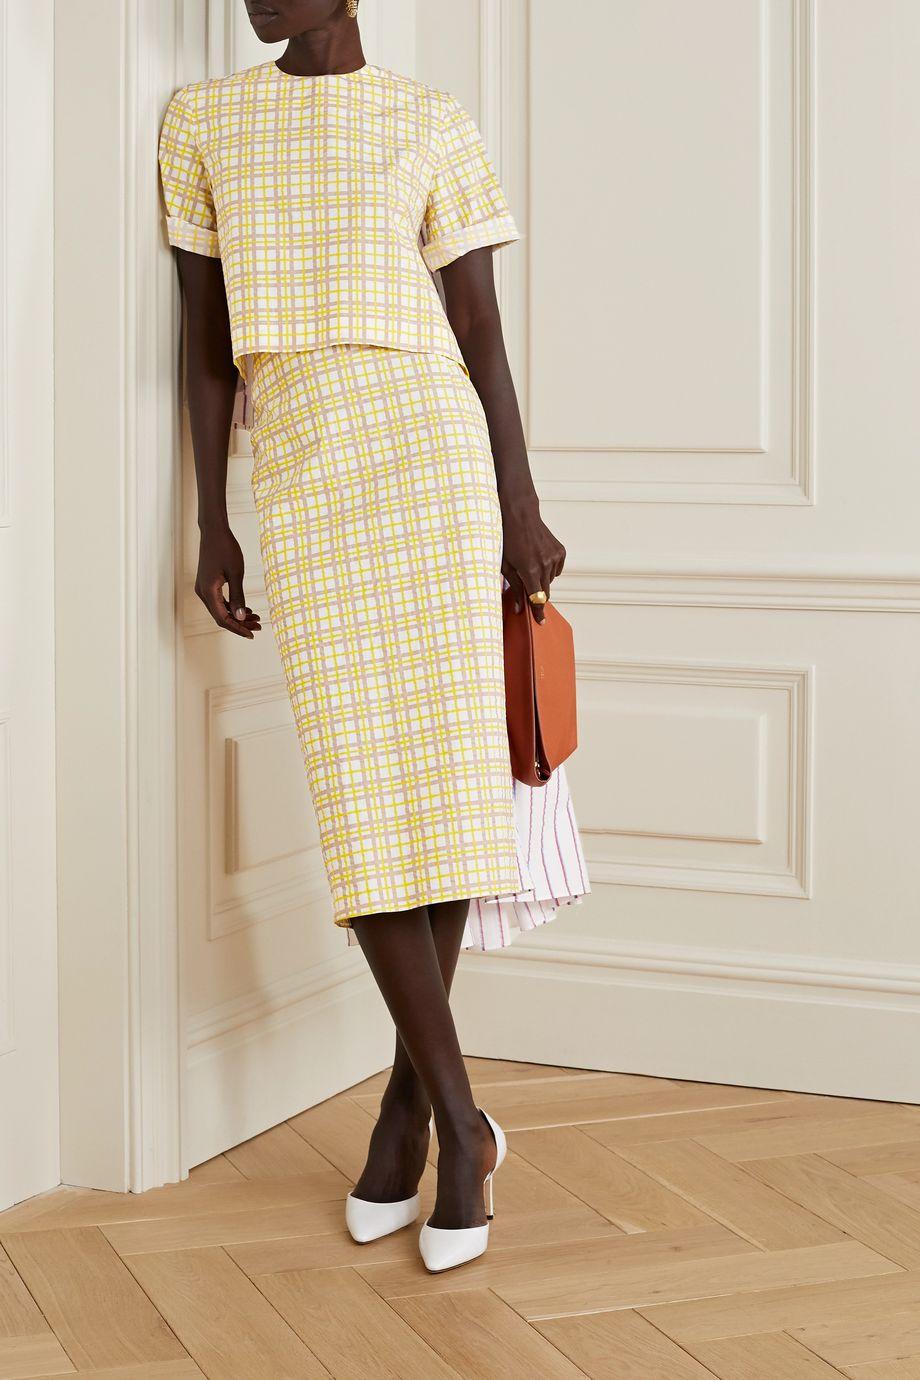 Rosie Assoulin Party In The Back paneled cotton-seersucker midi skirt